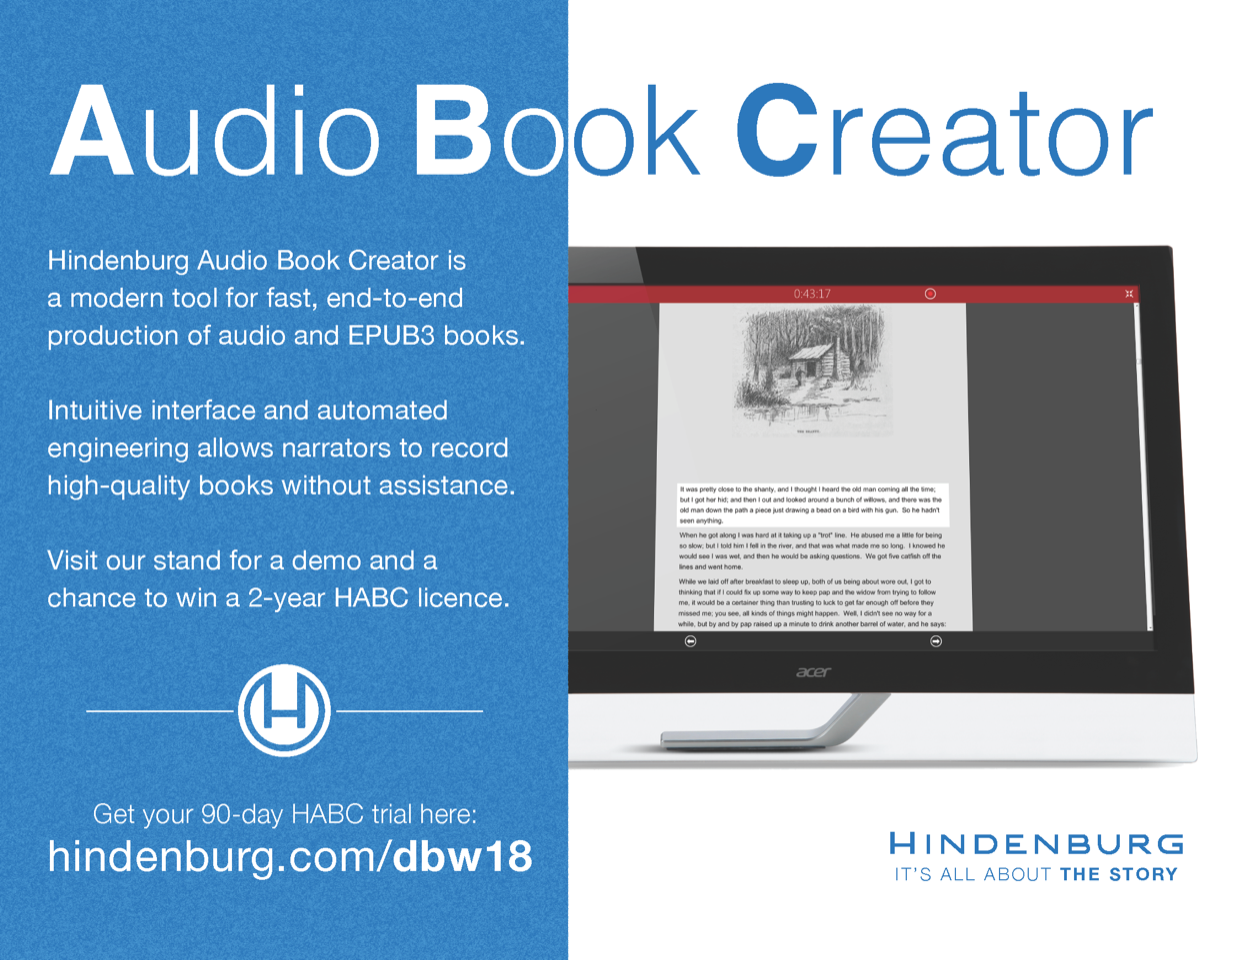 Digital Book World 2018: Hindenburg Systems - Brochures